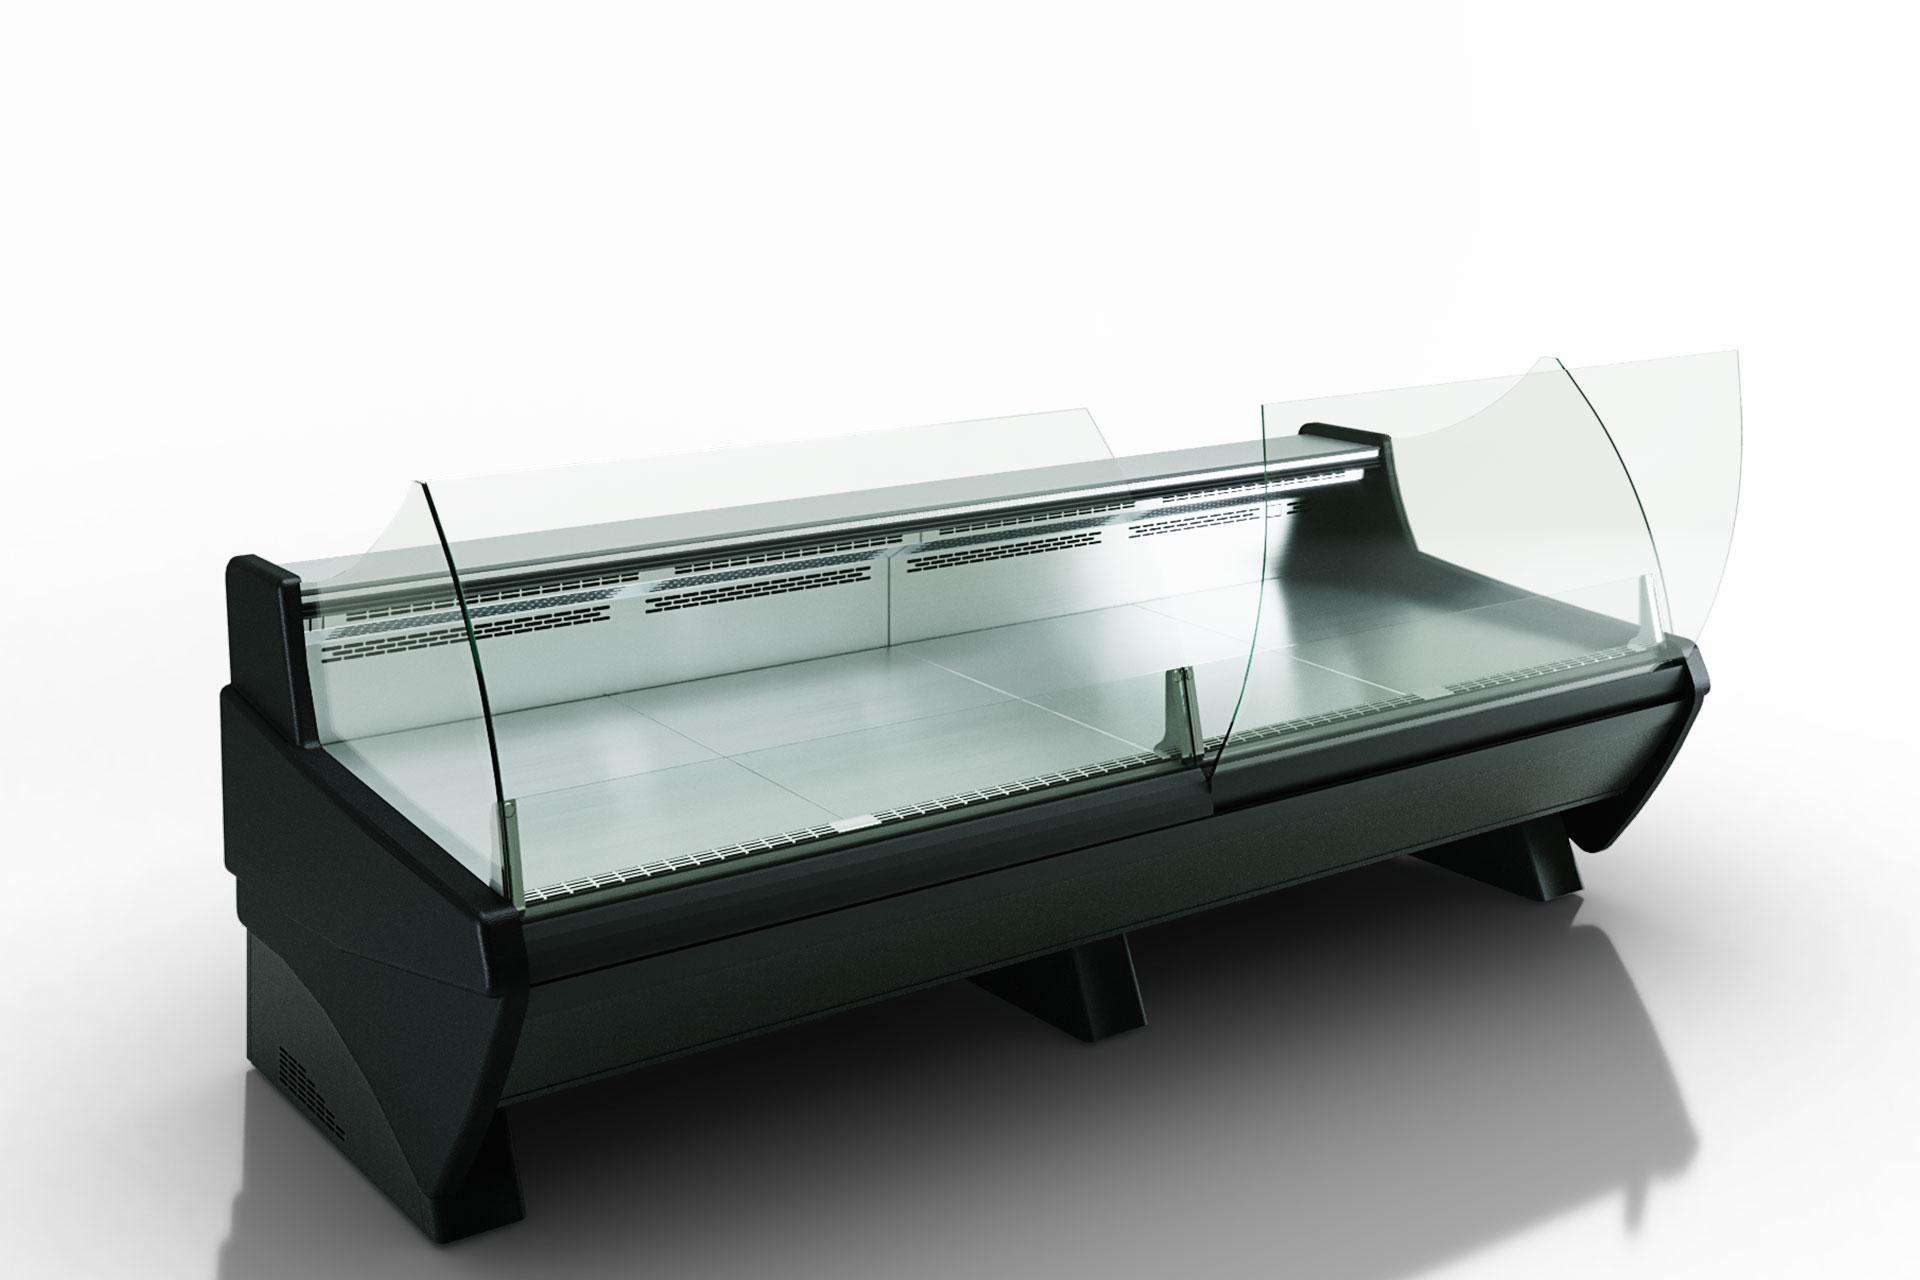 Kühlvitrinen Symphony luxe MG 100 deli T2 110-DLM